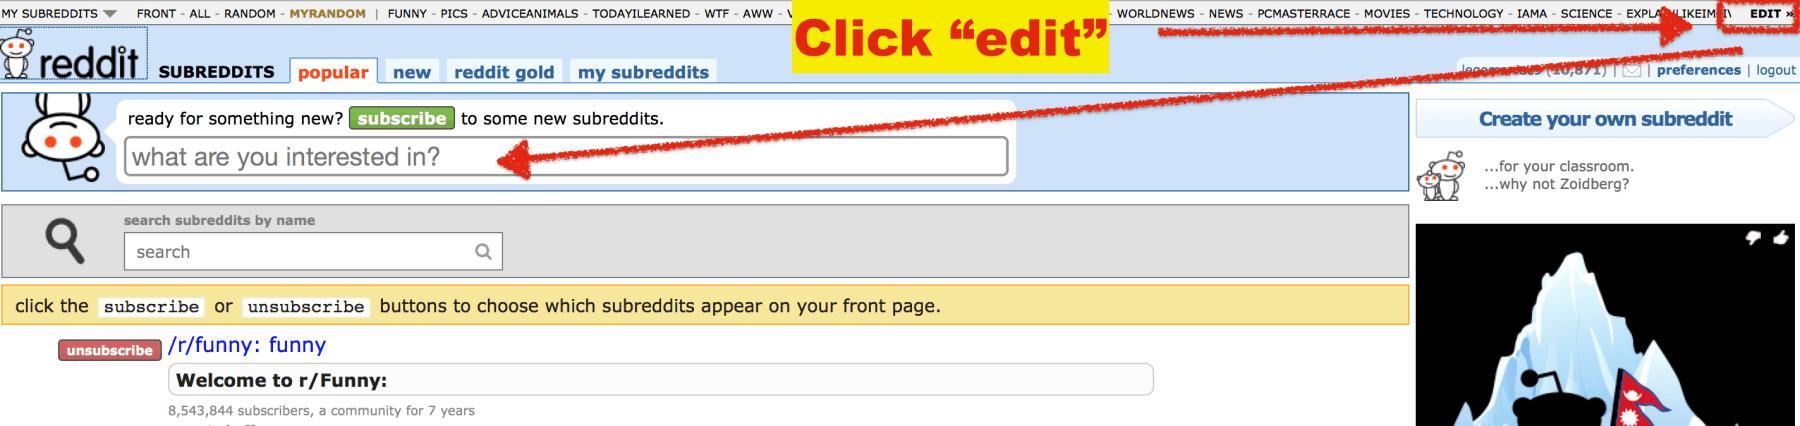 Researching Reddit Subreddits